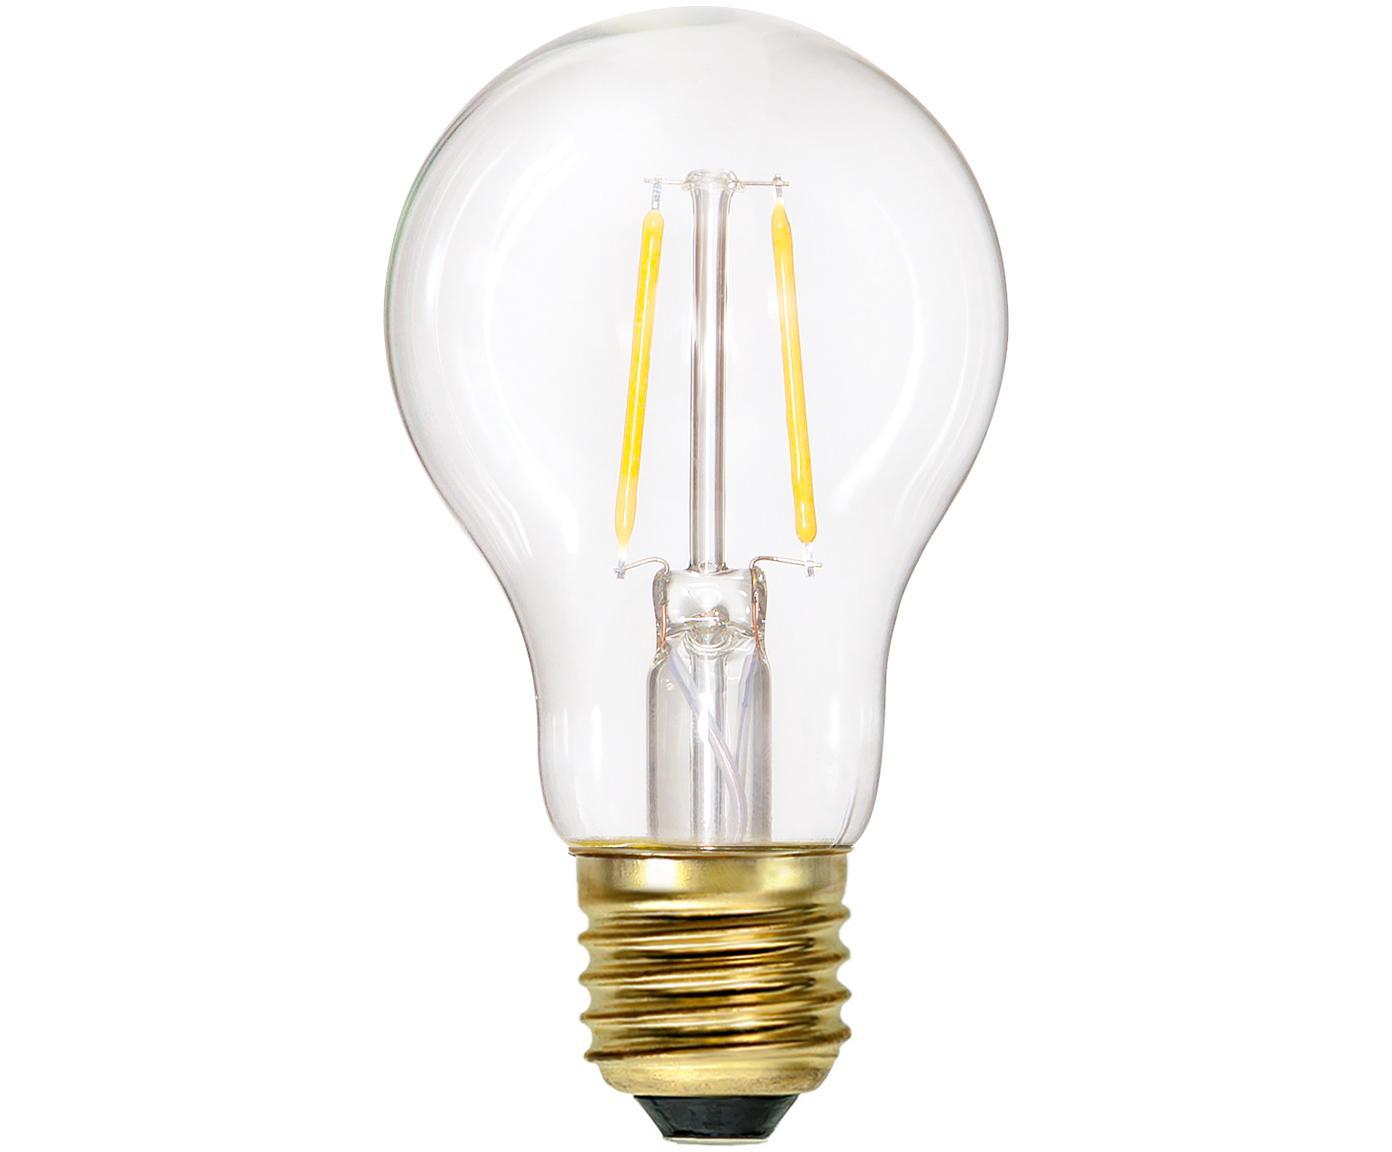 LED Leuchtmittel Airtight Stream (E27/1.6W), Leuchtmittelschirm: Glas, Leuchtmittelfassung: Messing, Transparent, Messing, Ø 6 x H 11 cm